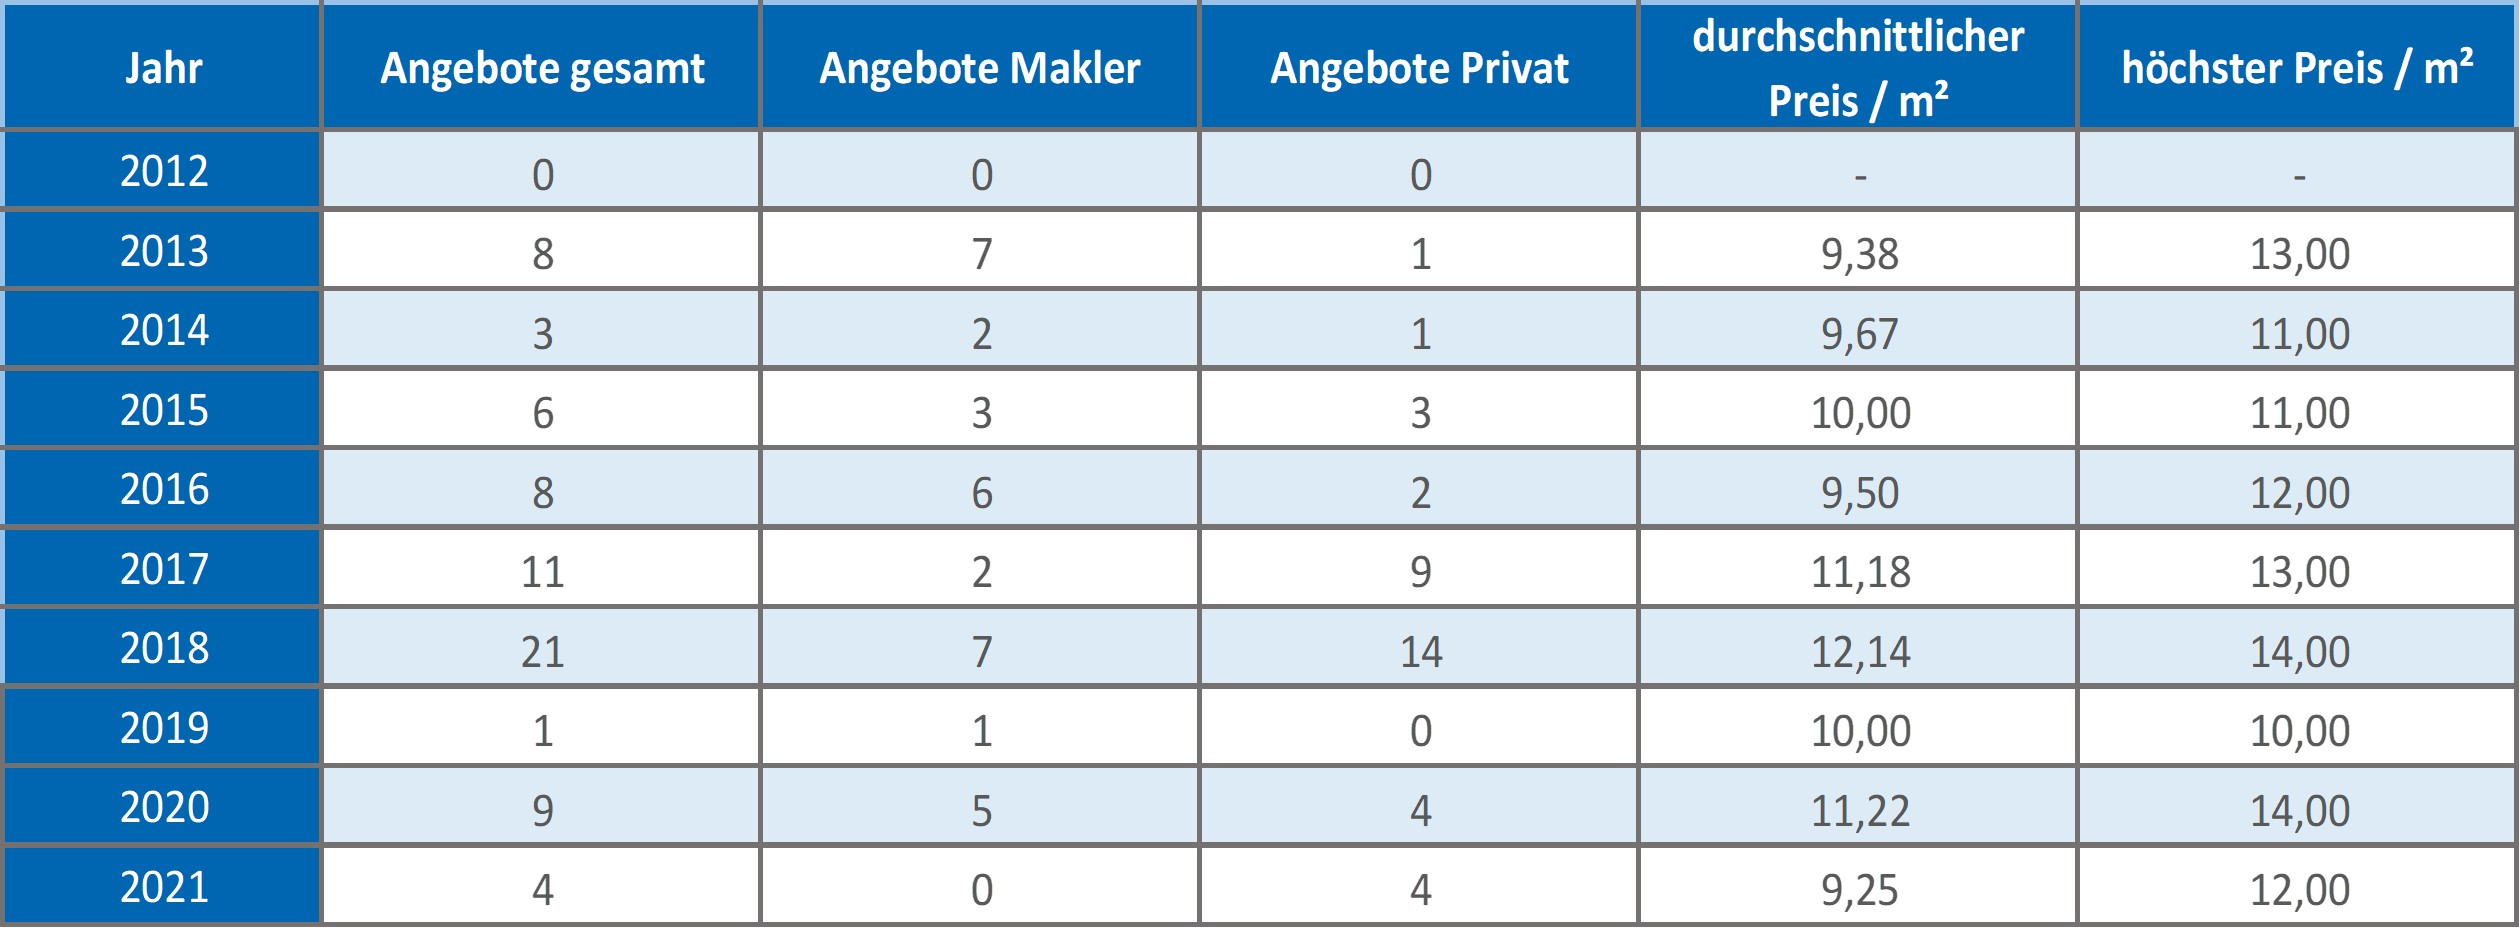 Egmating Haus mieten vermieten Preis Bewertung Makler www.happy-immo.de 2019 2020 2021